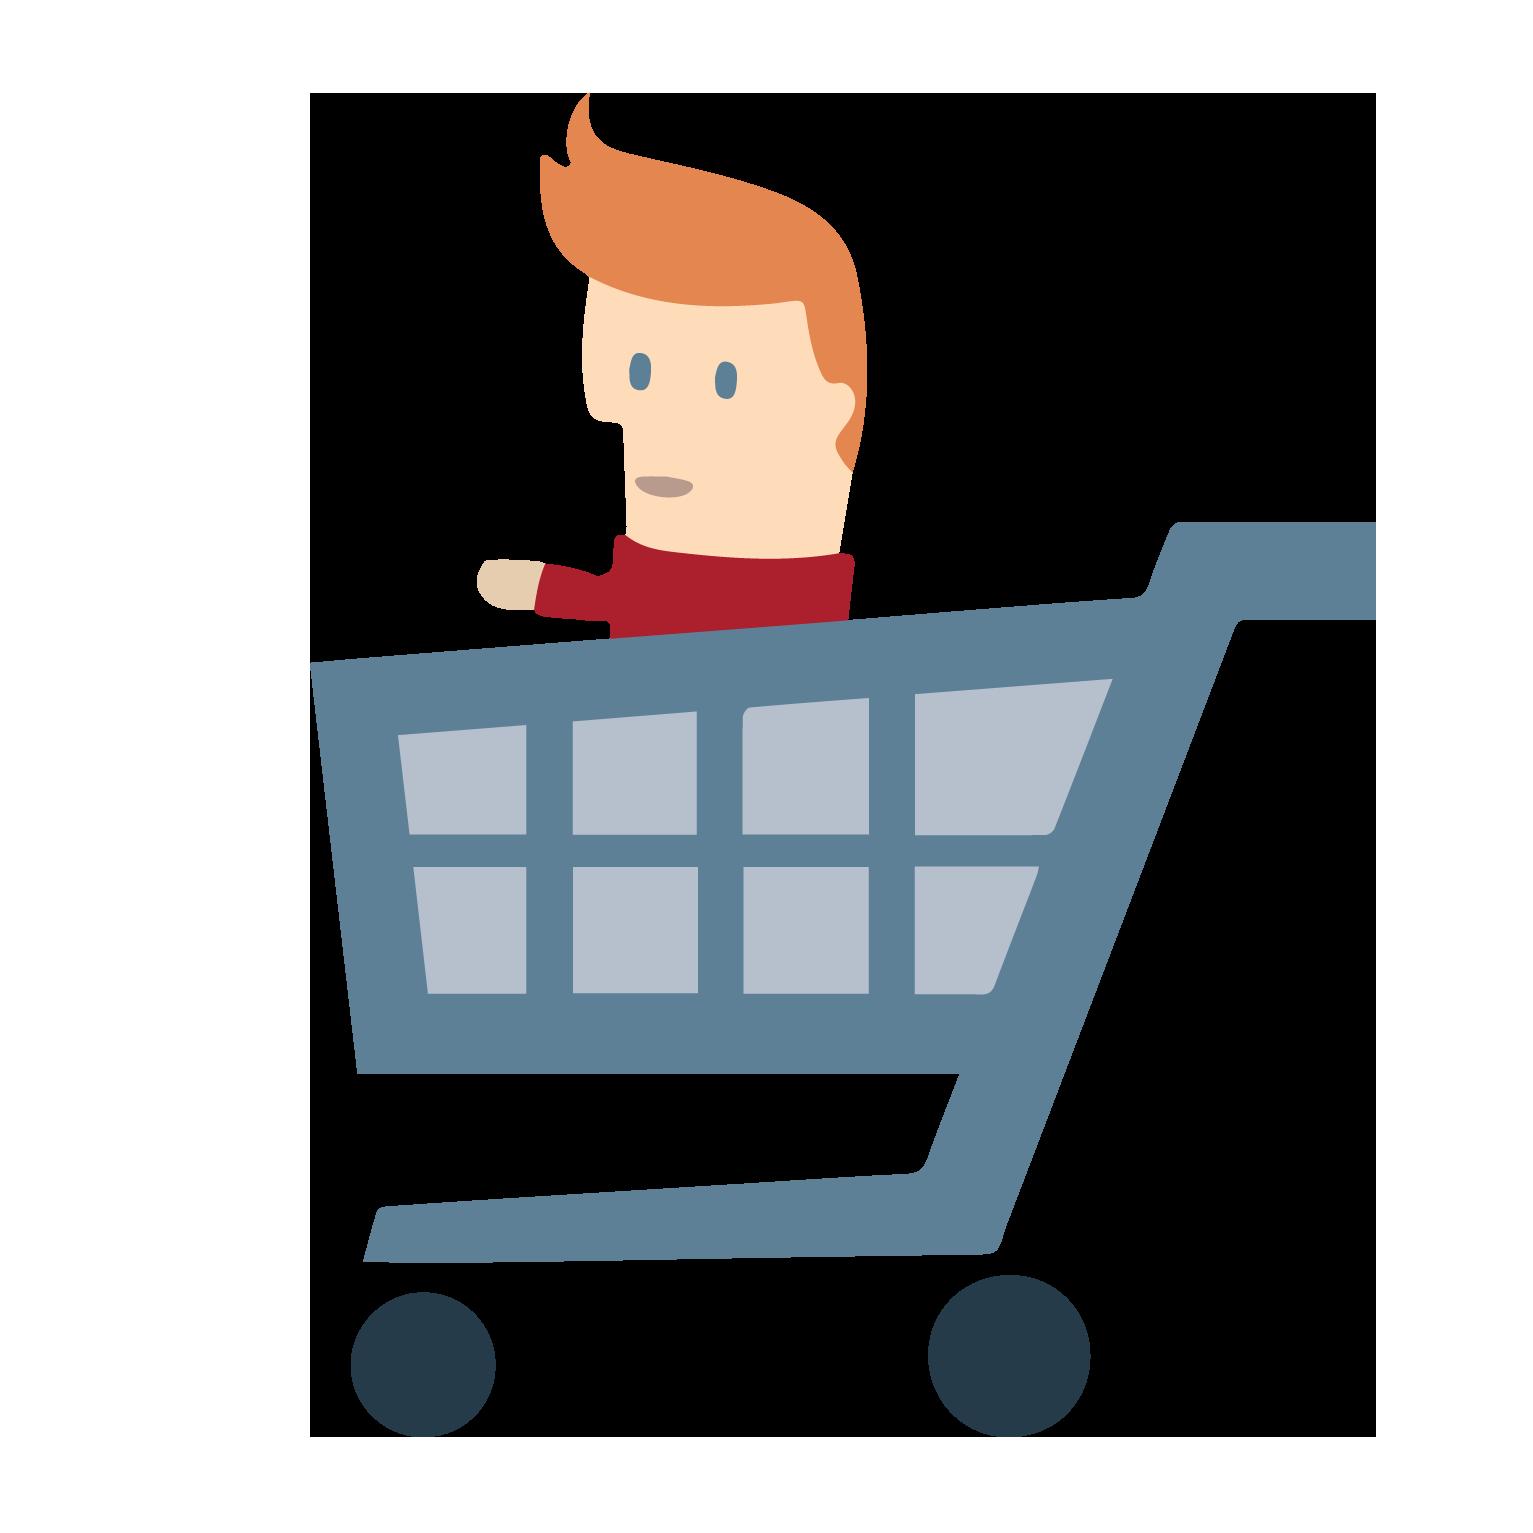 YOH_Illustration-shopping-cart-man_(1)